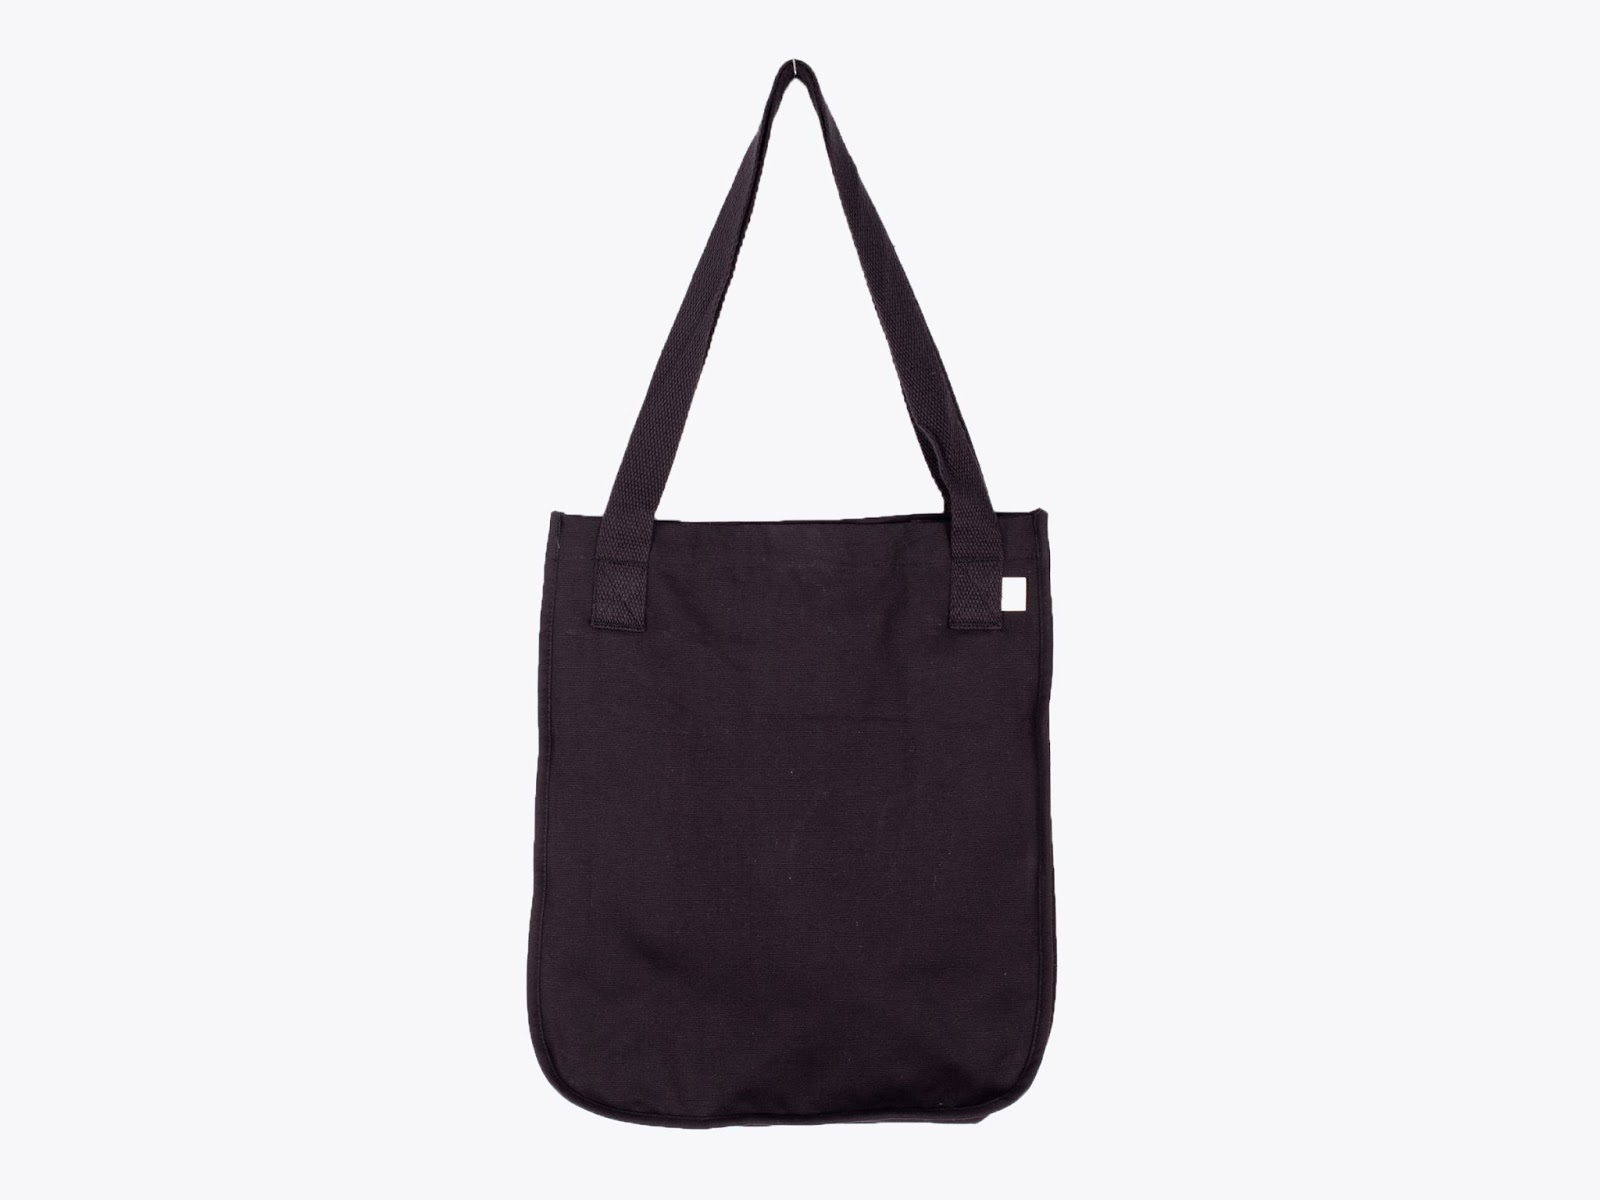 econscious EC8040 Organic Cotton Canvas Market Black Tote Bag